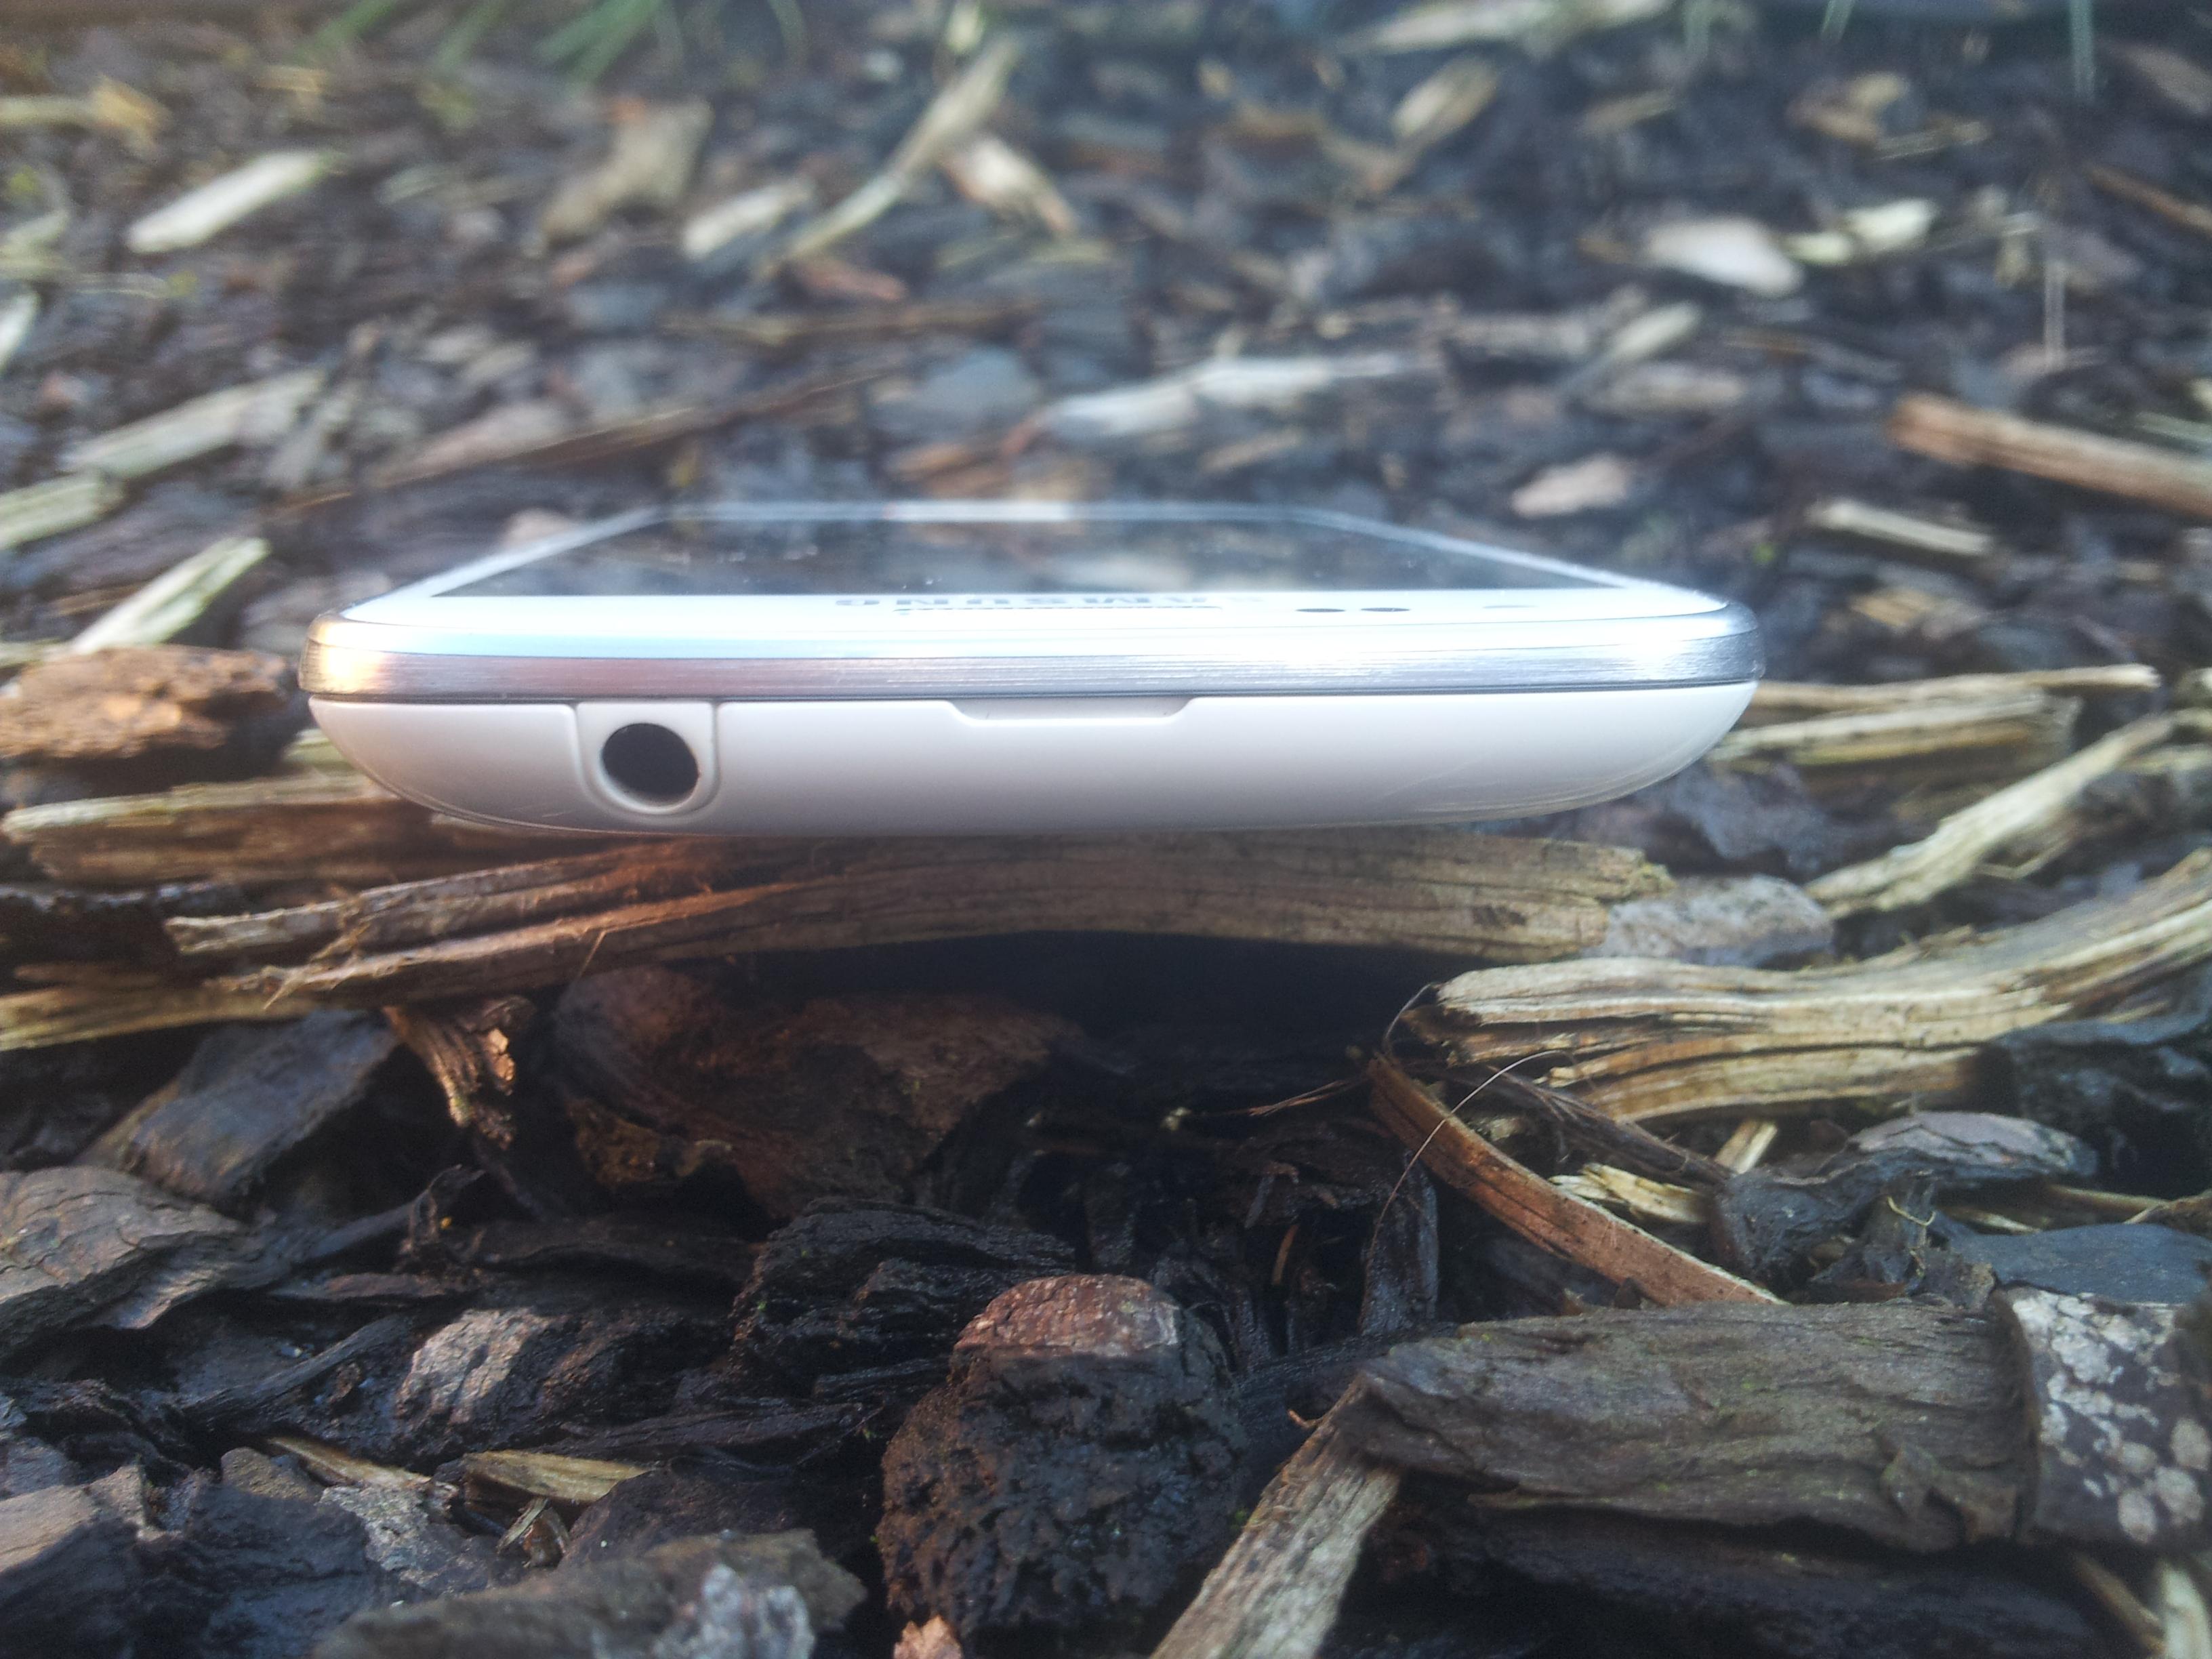 20130202 130845 Coolsmartphone